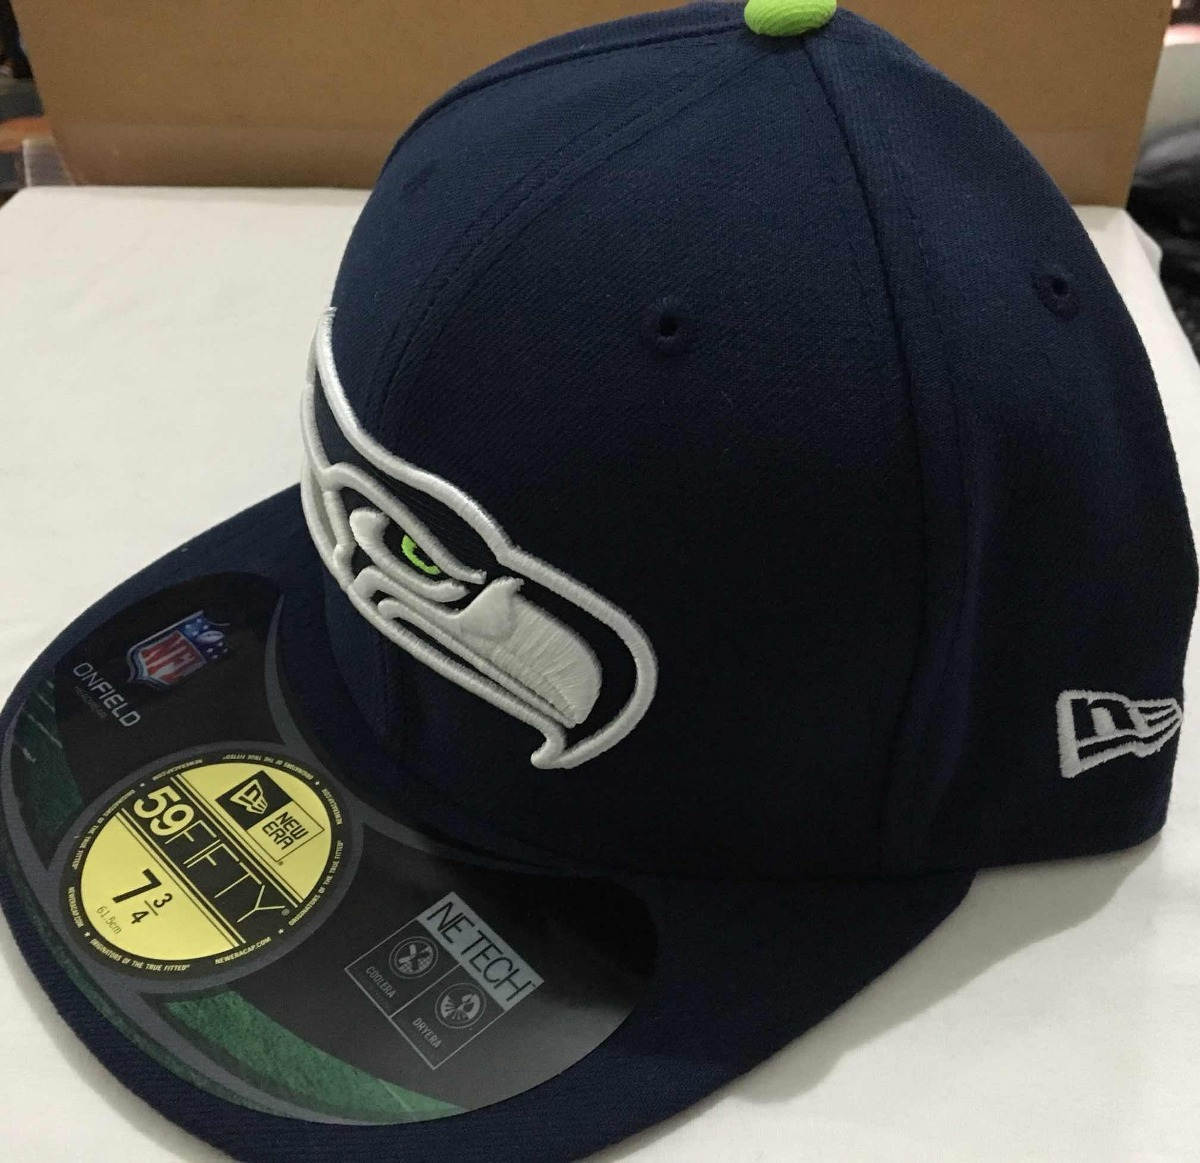 056d5466731ad Nfl Seattle Seahawks Gorra New Era 7 3 4 -   680.00 en Mercado Libre